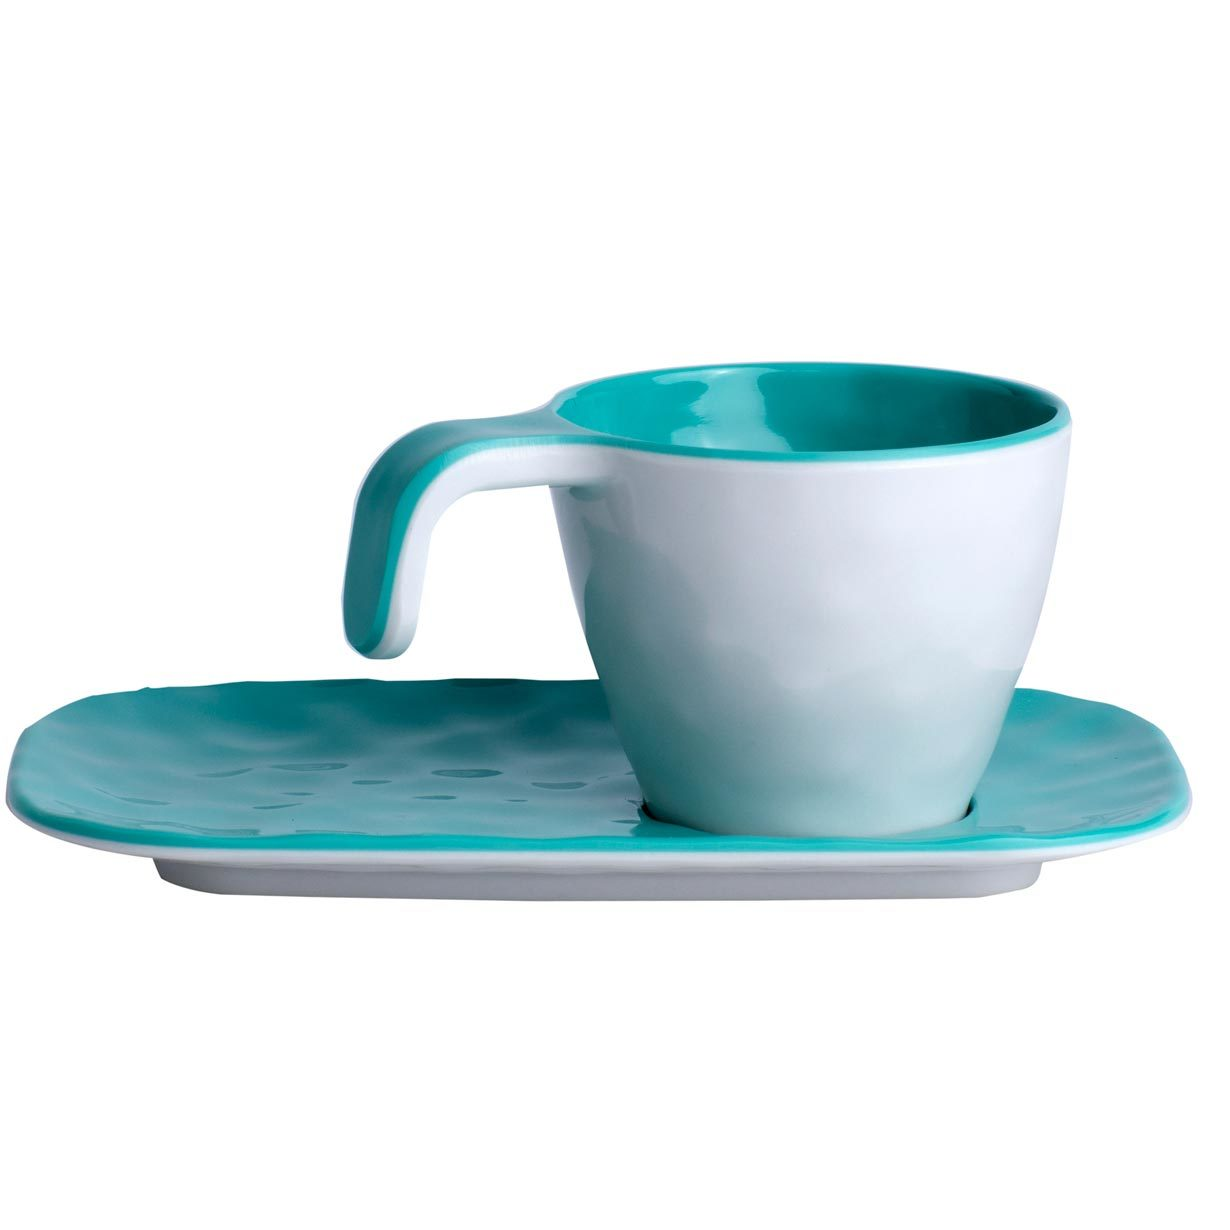 Melamine Coffee Set, Summer collection, colour Aqua